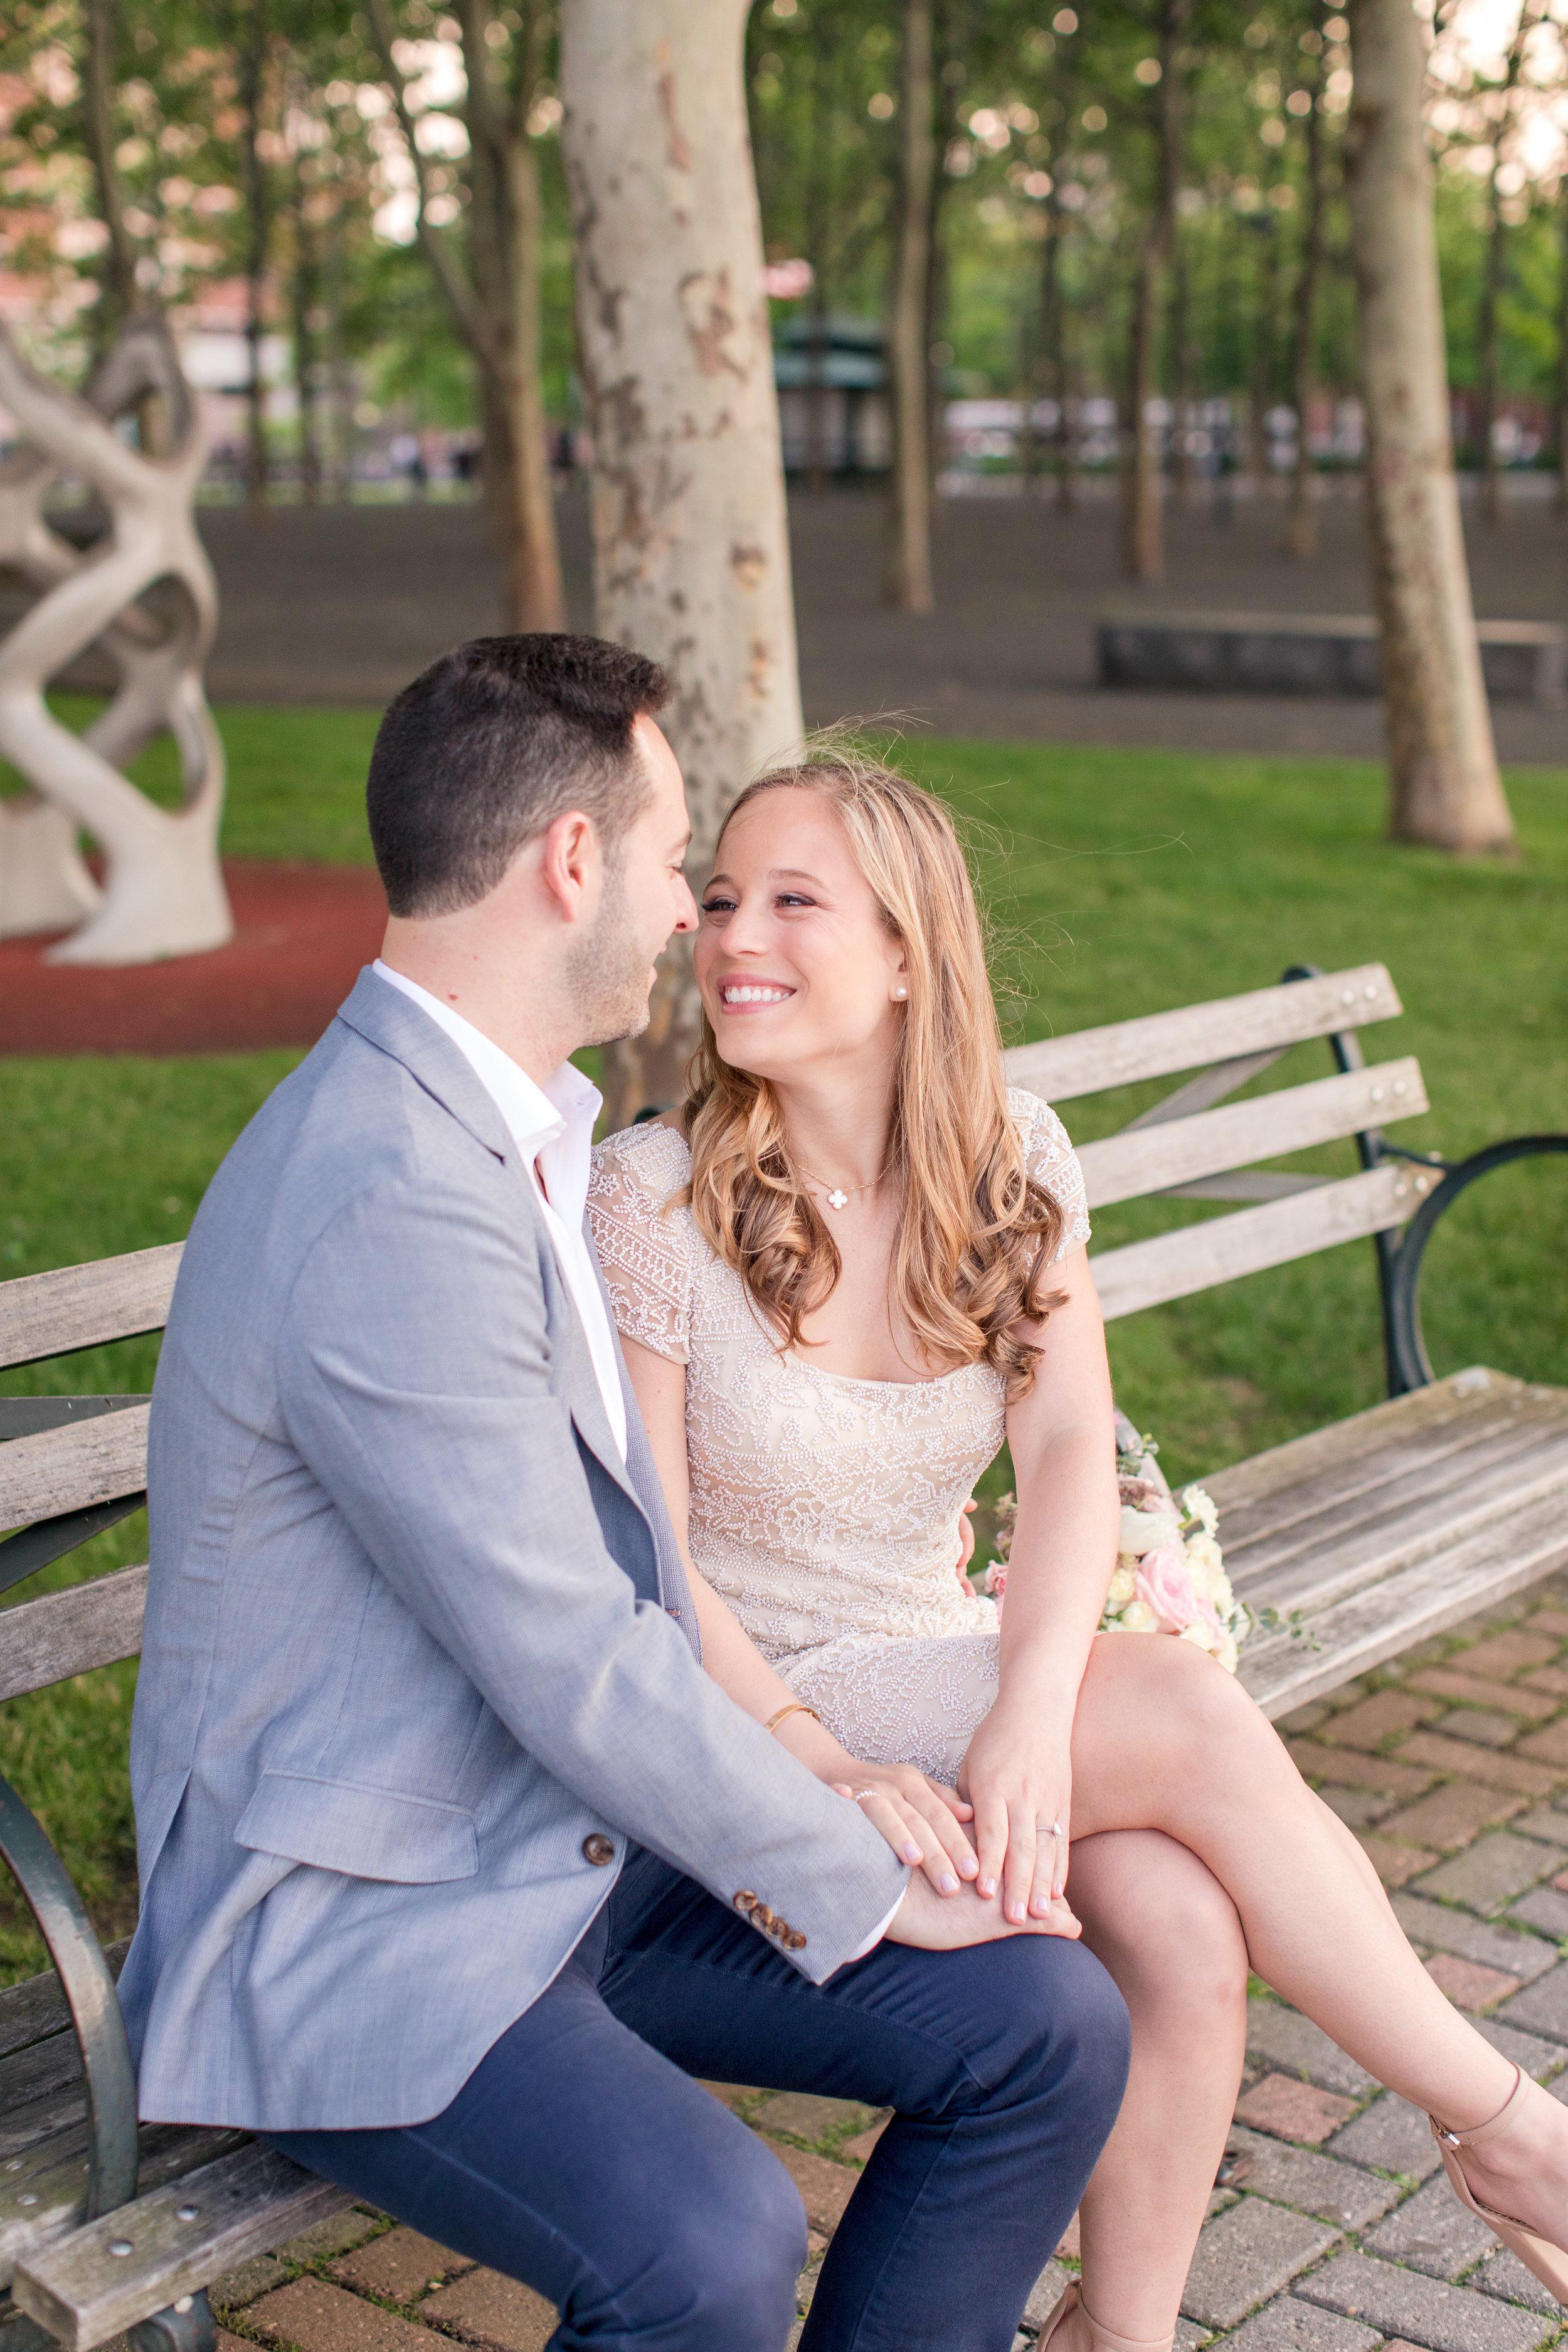 Ultimate Engagement Giveaway - Alyssa & Al - 05